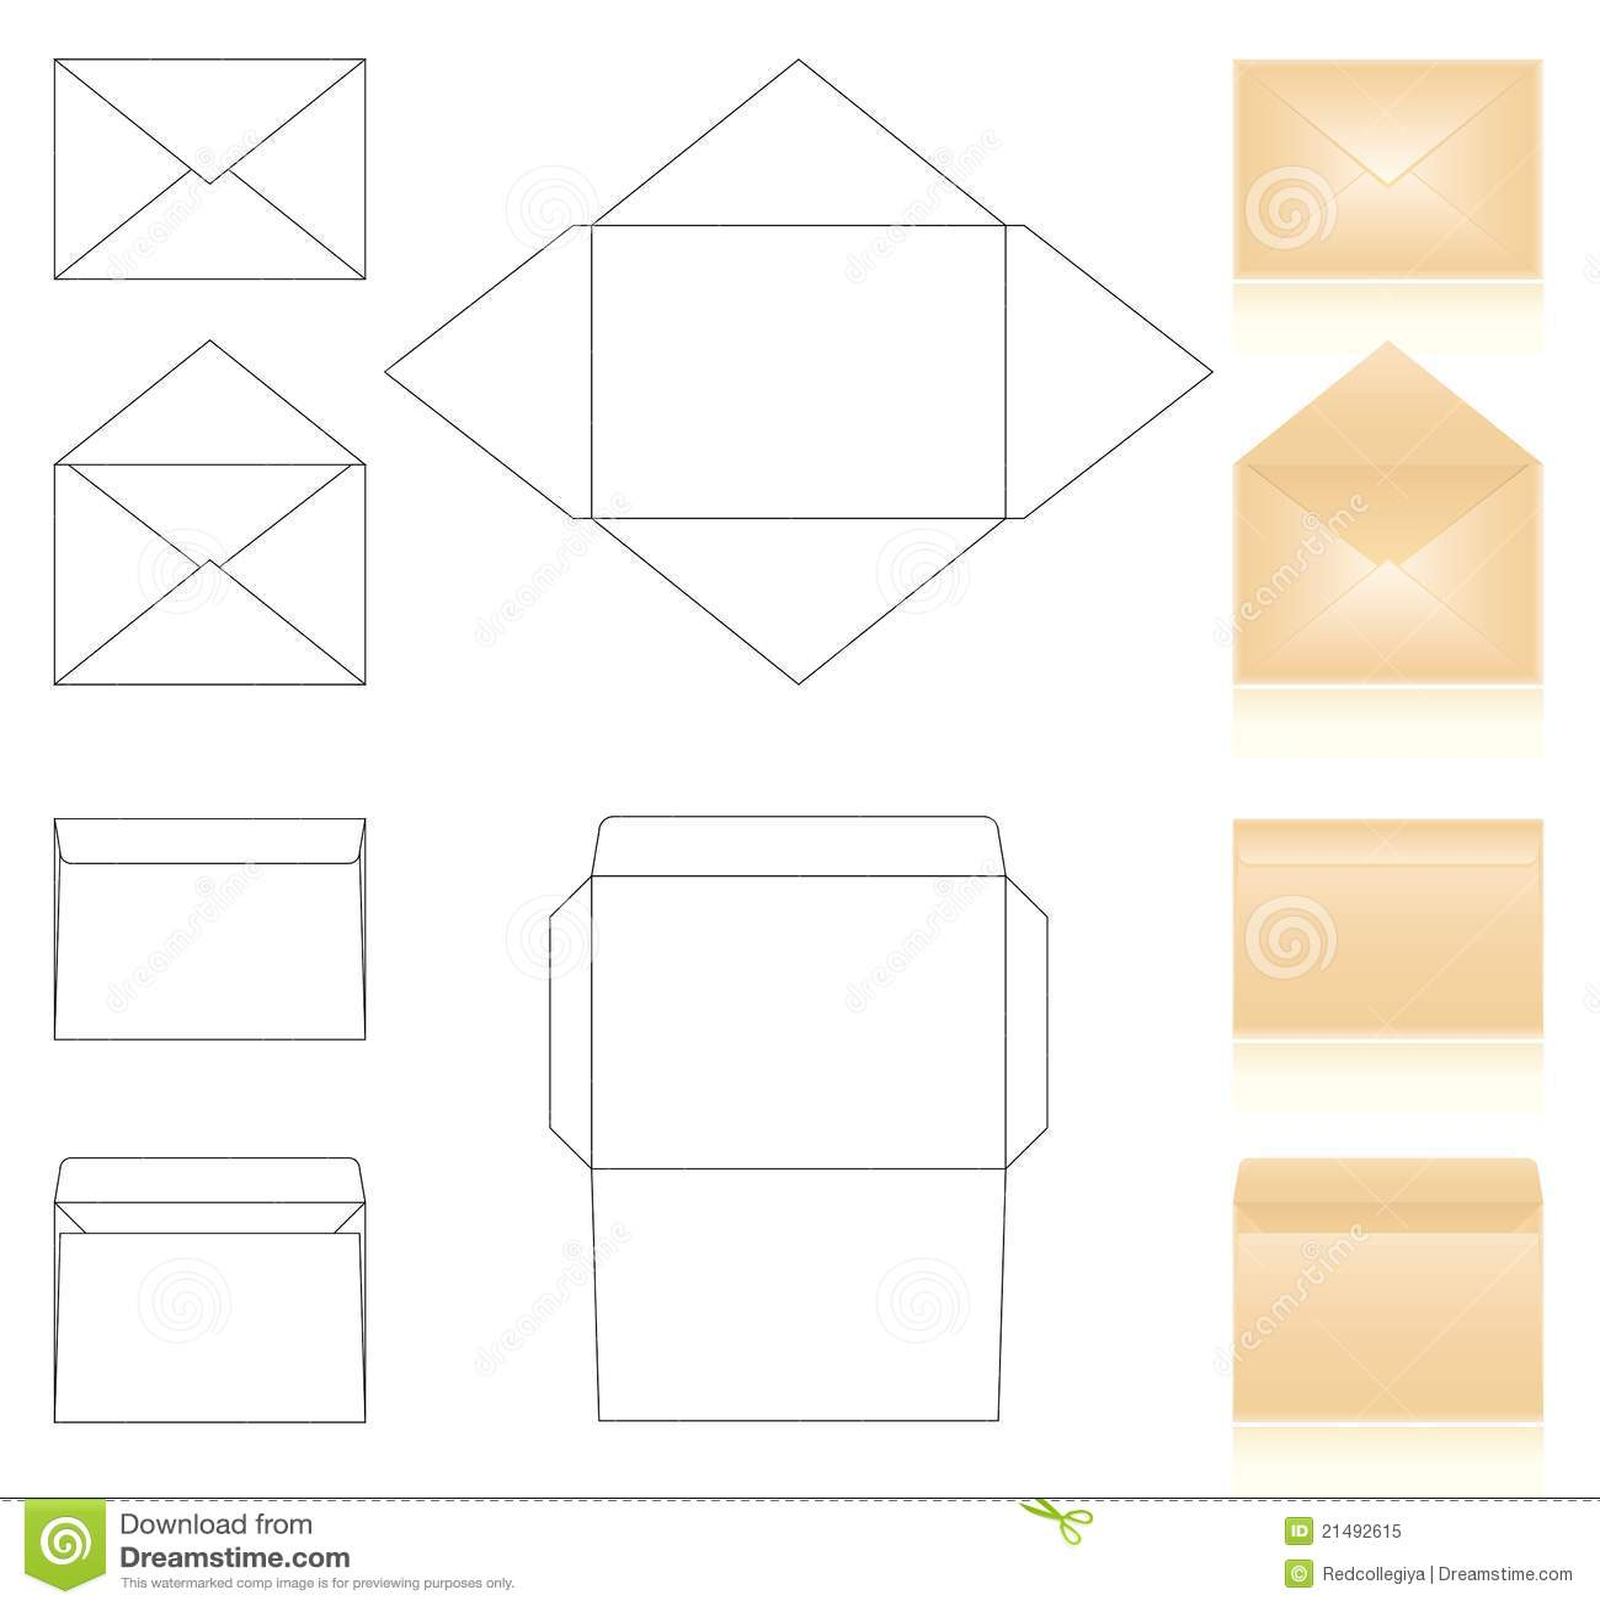 Envelopes templates stock vector. Illustration of corporative - 21492615